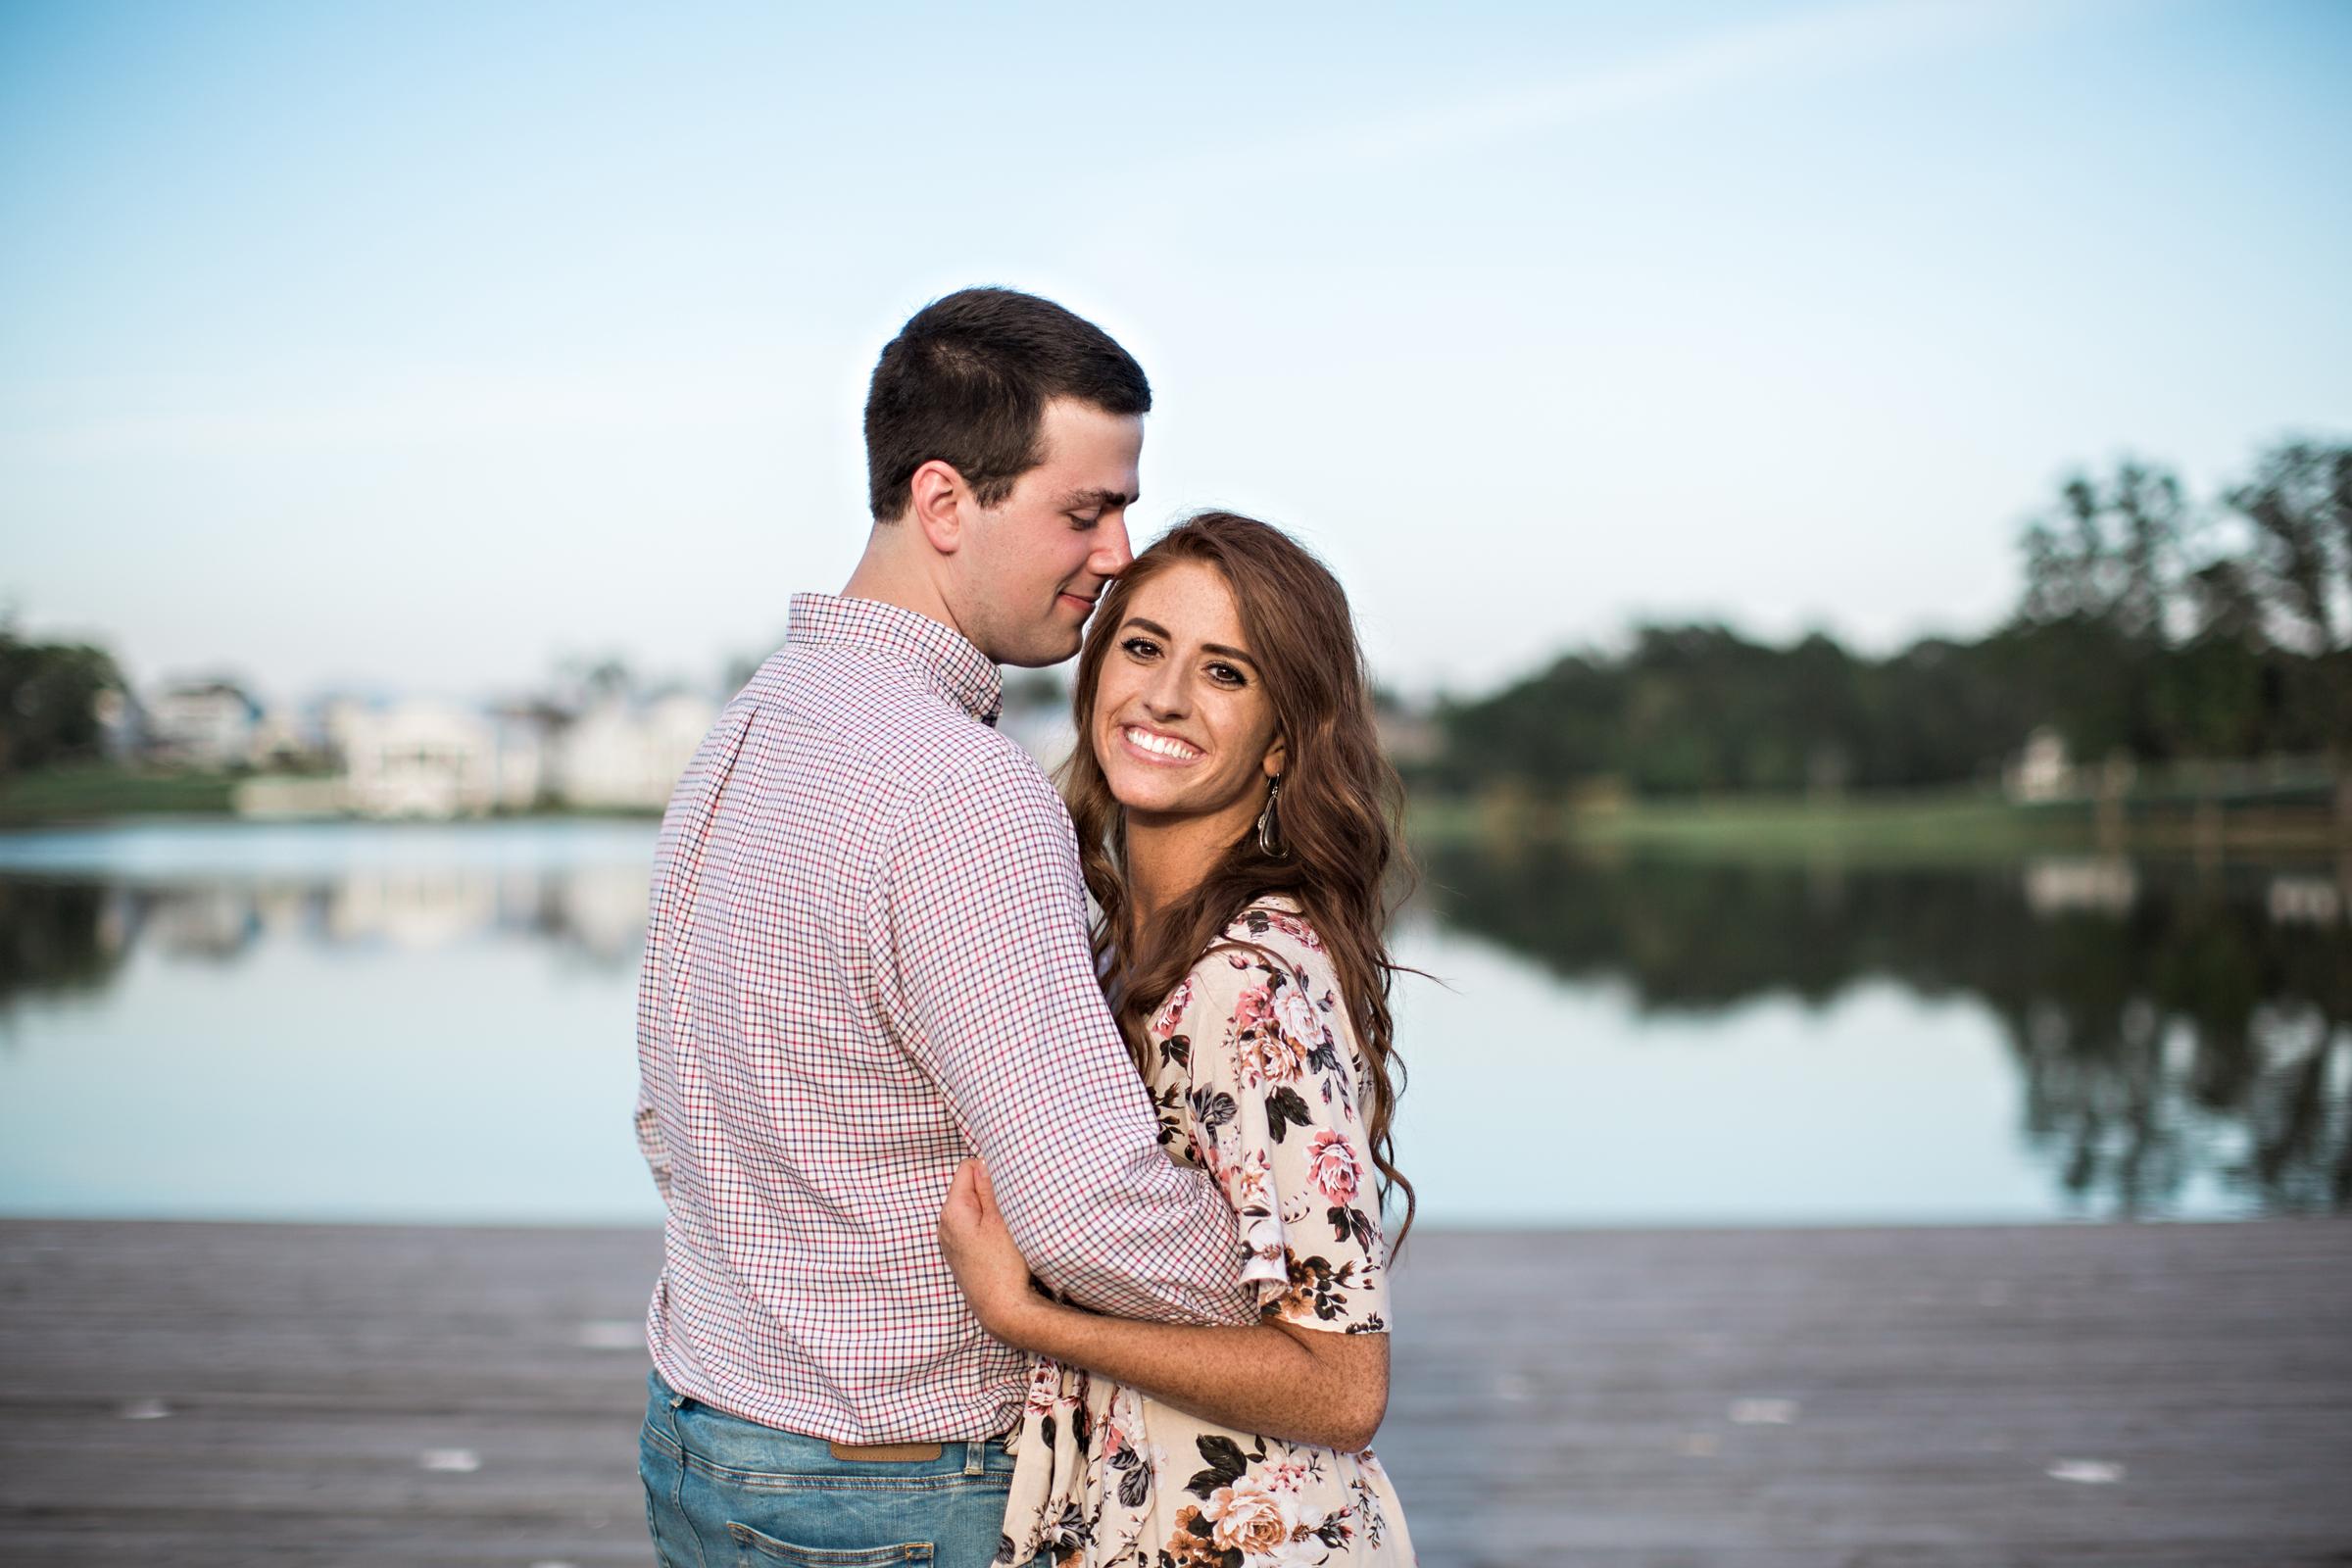 Alabama-Wedding-Photography-Montgomery-Nick-Drollette-108.jpg